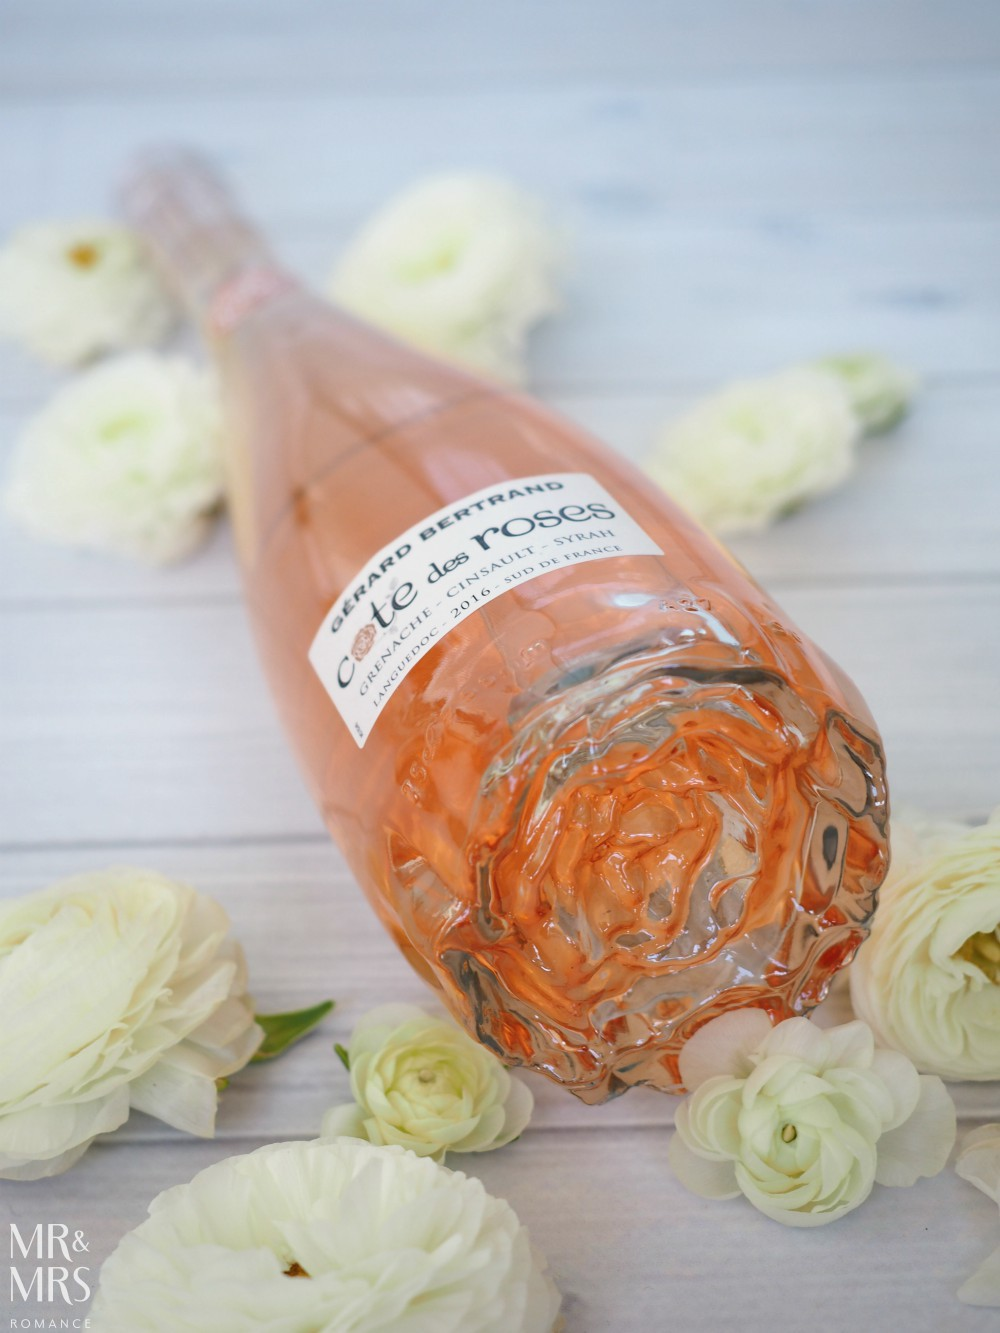 Summer rosés - Christmas wine - MMR - Cotes des Roses